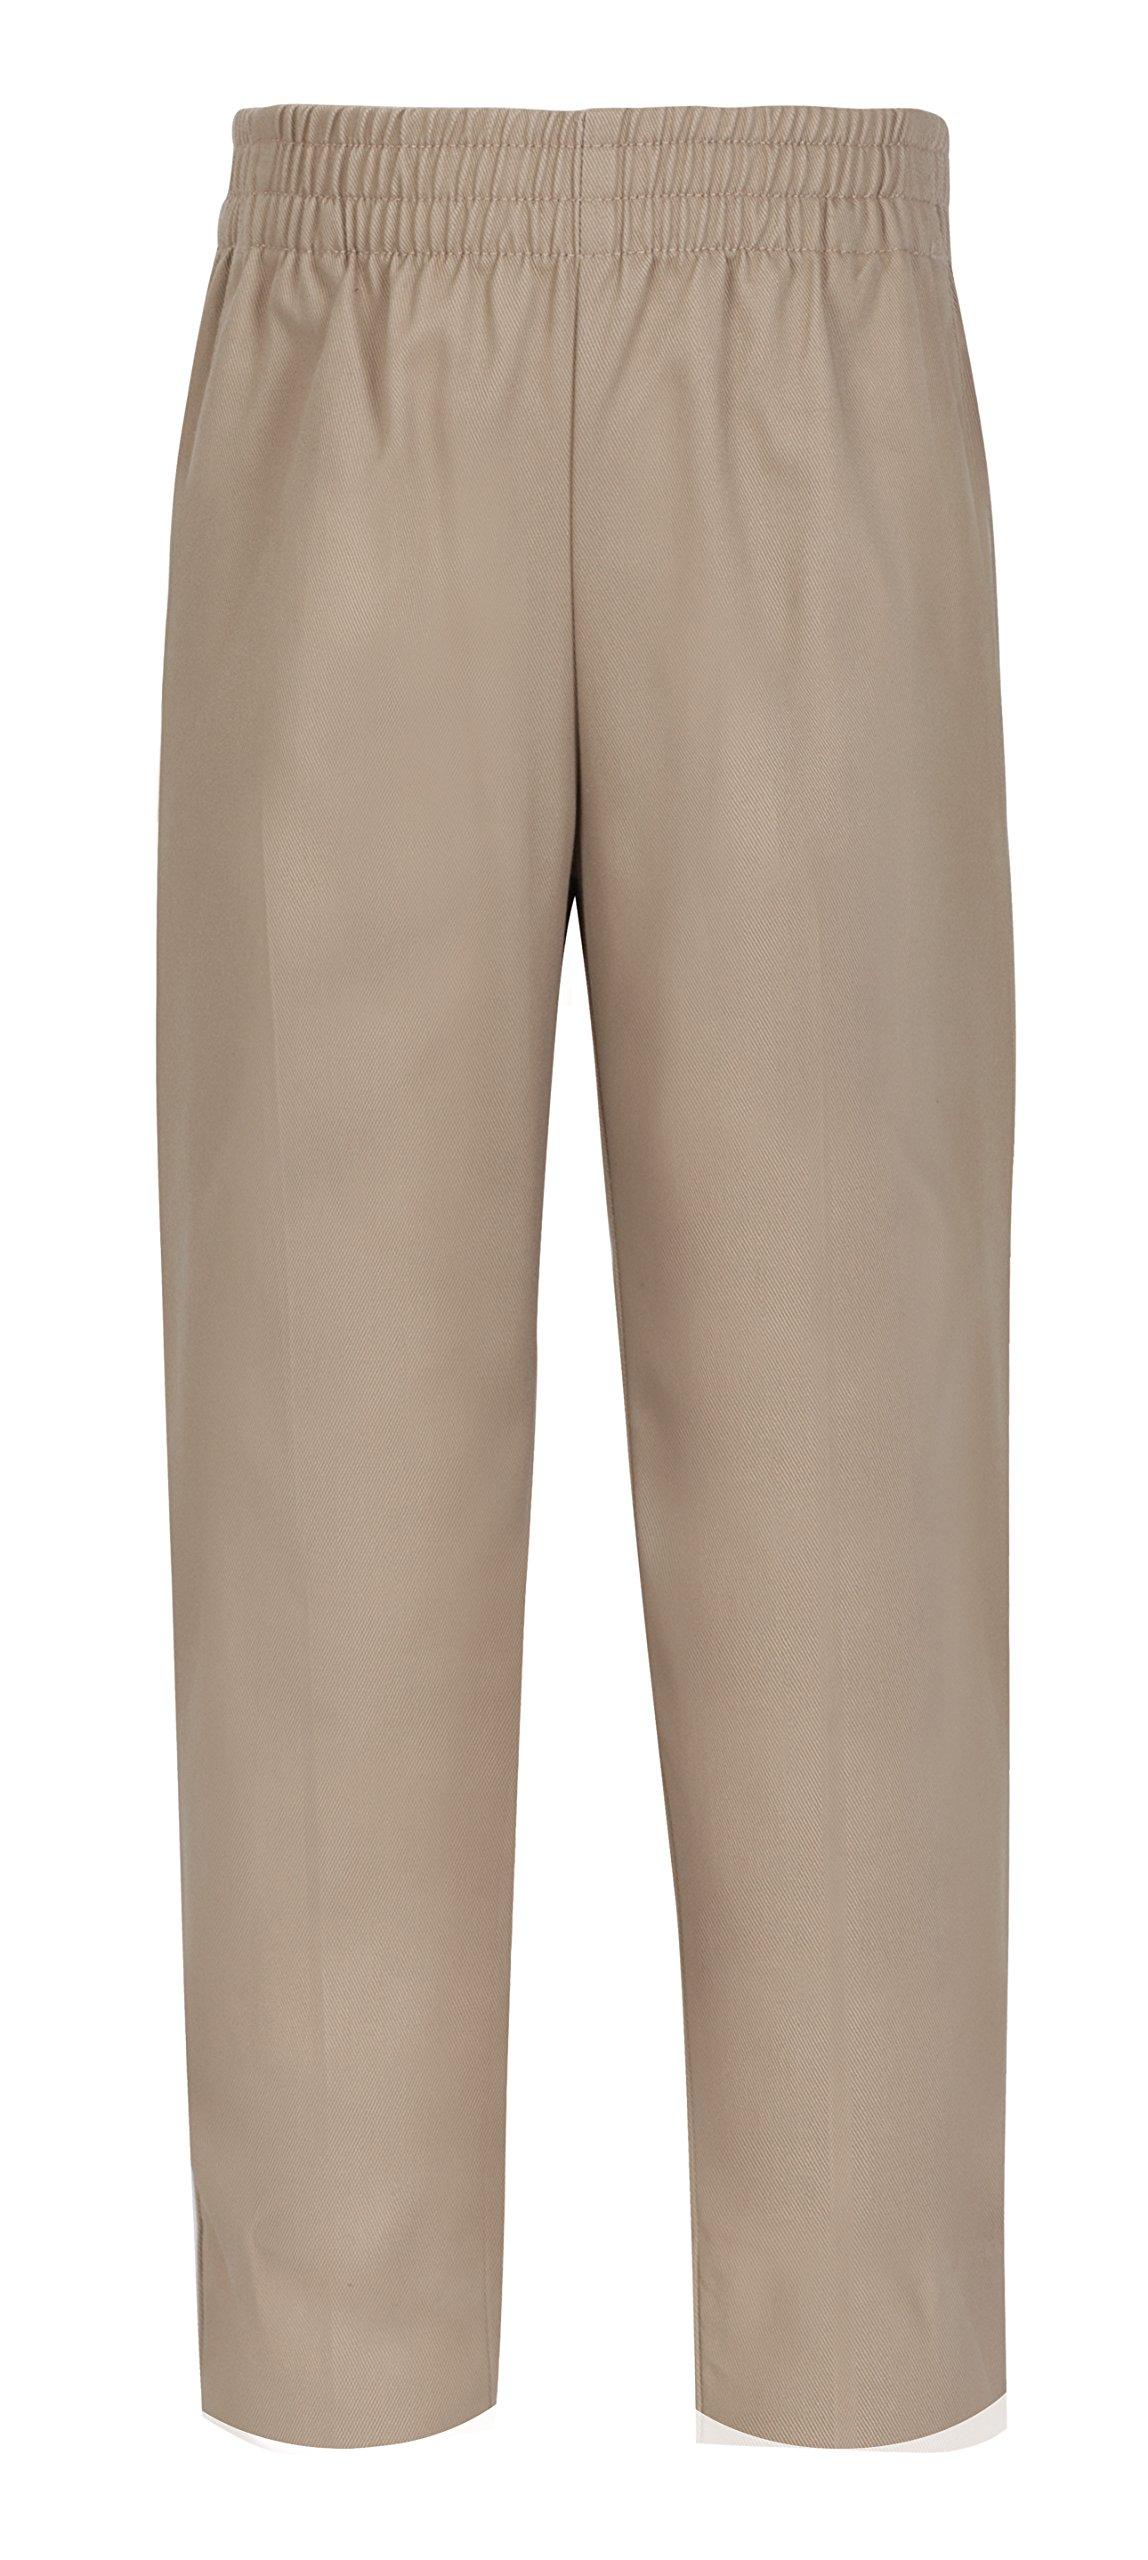 Classroom Little Boys' Toddler Uniform Pull-On Pant, Khaki, 4T